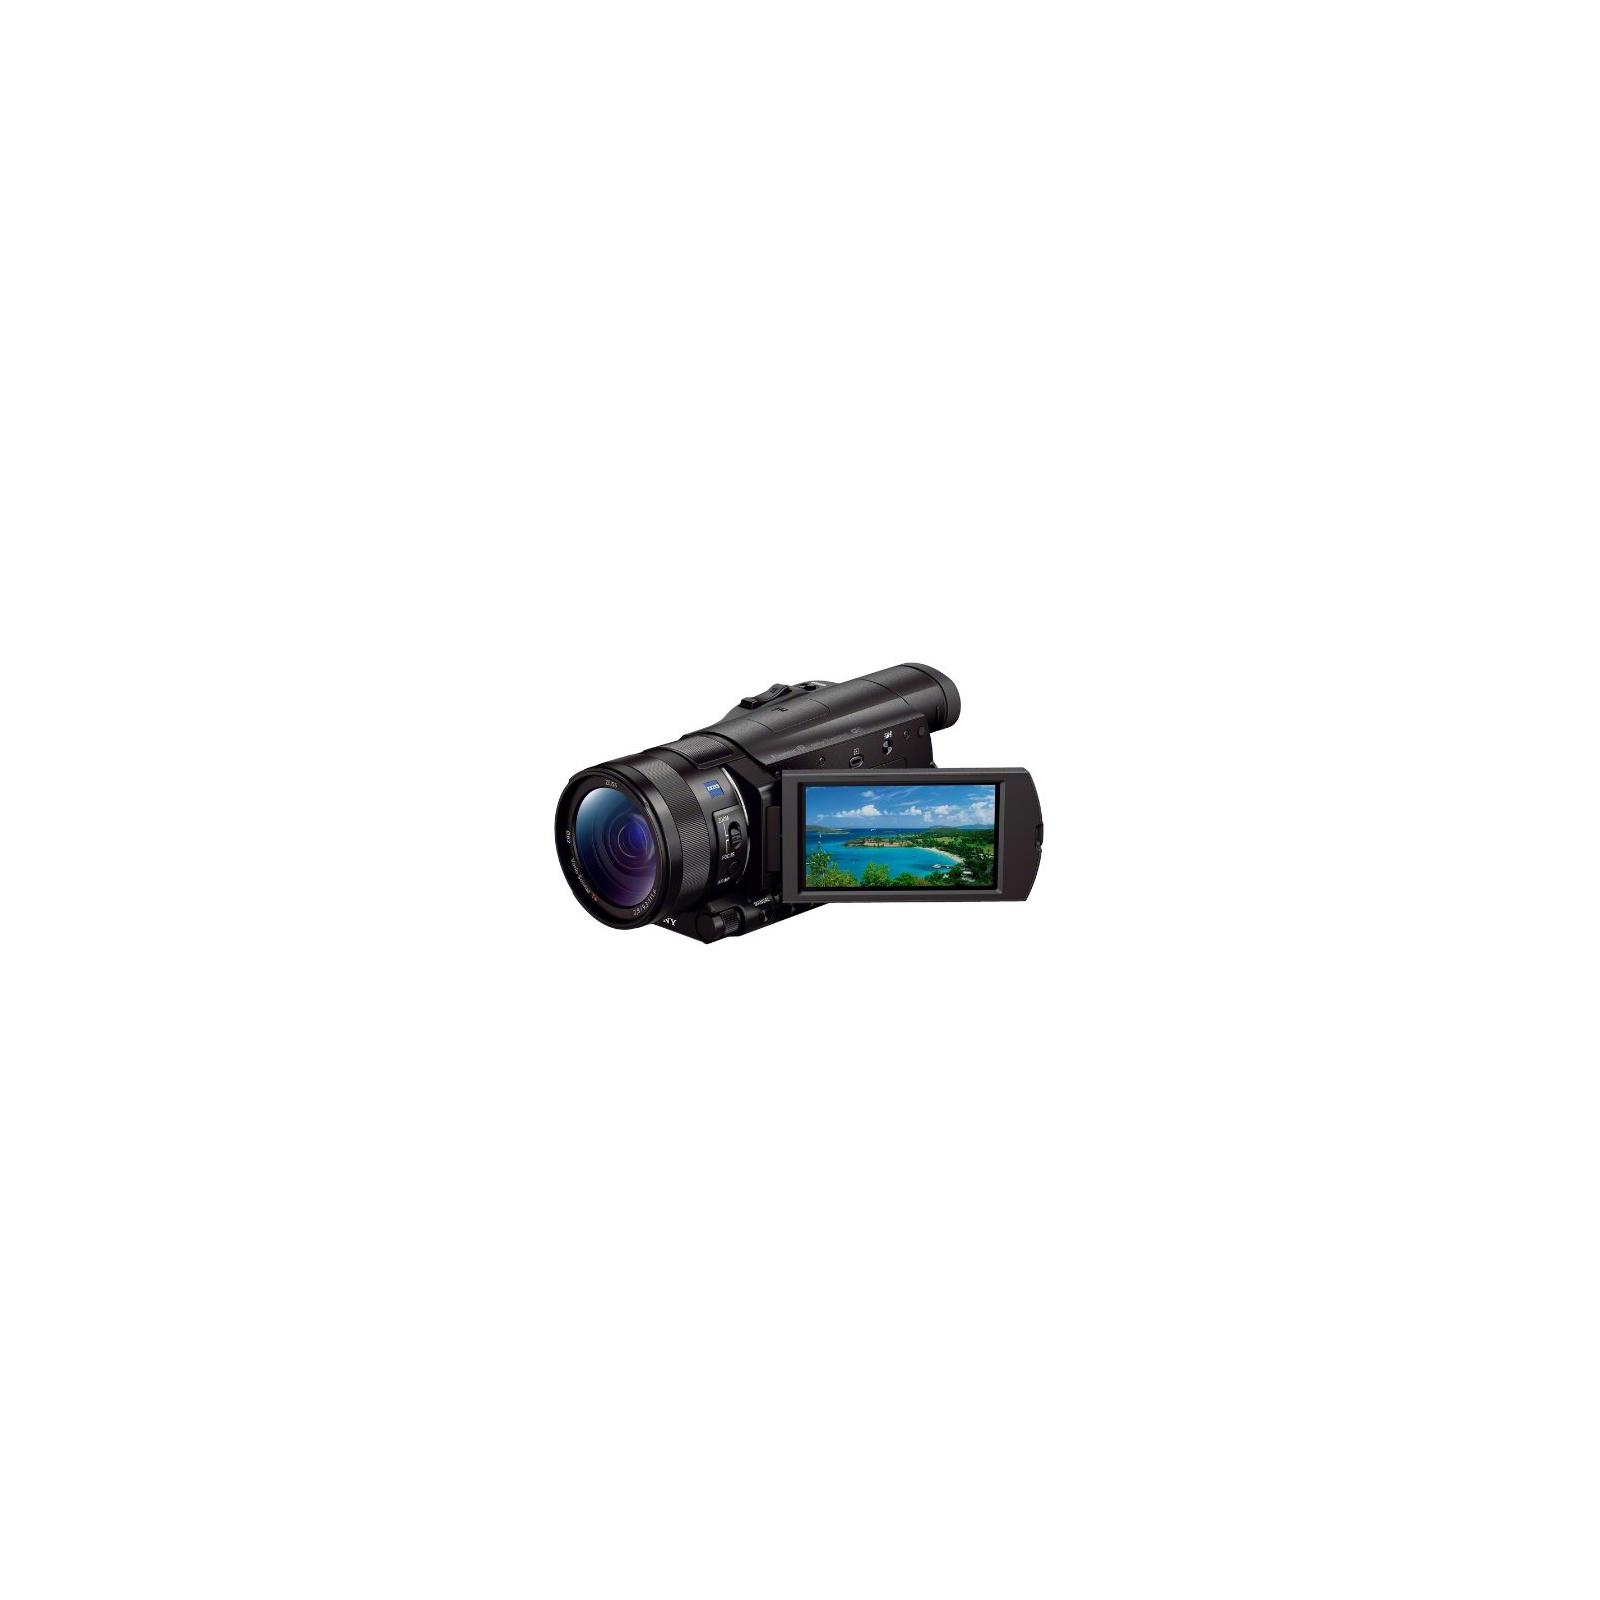 Цифровая видеокамера SONY Handycam HDR-CX900 Black (HDRCX900EB.CEN) изображение 3